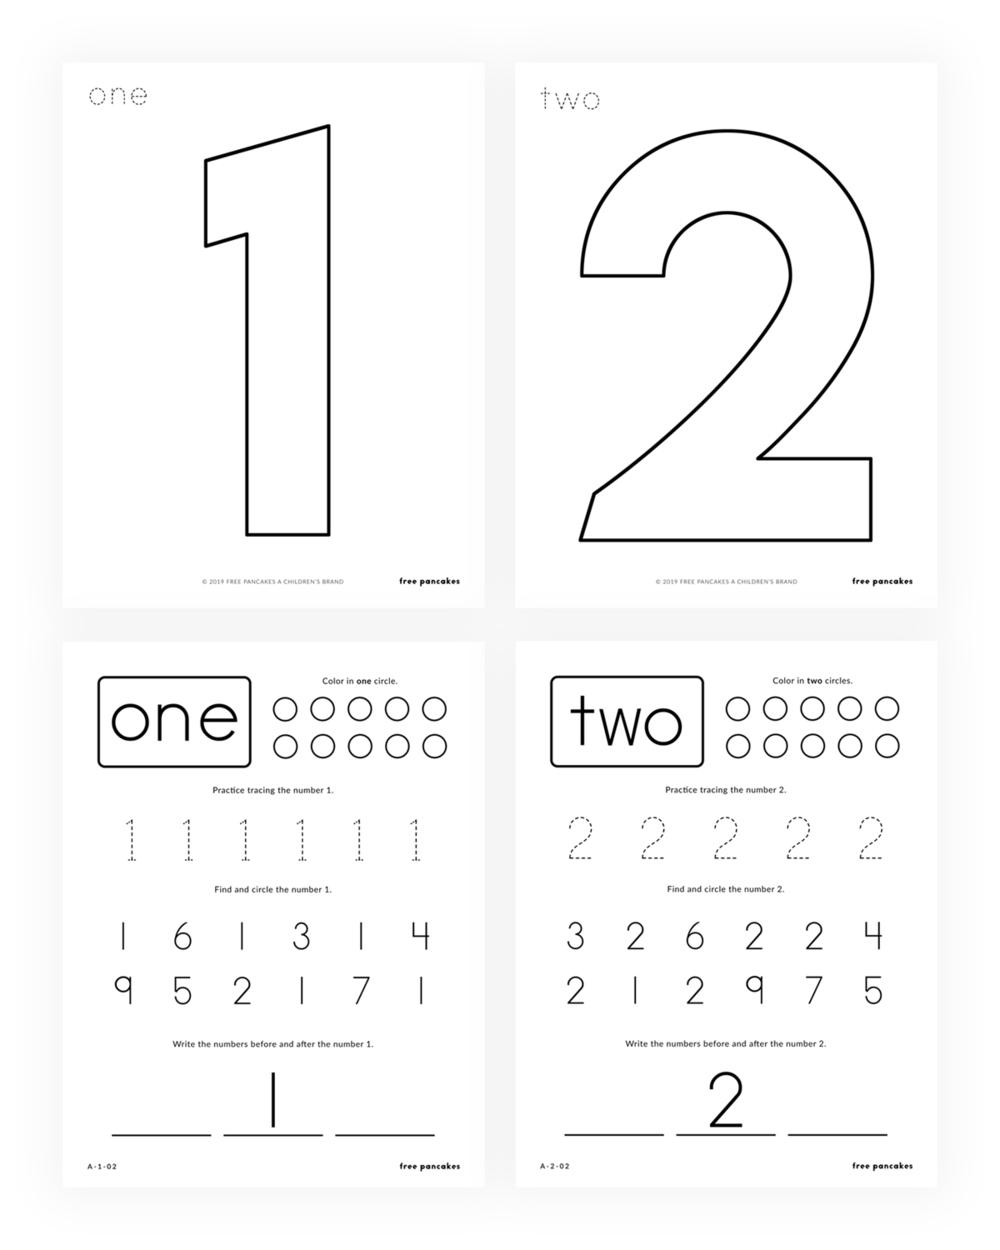 Printable Math Worksheets For Preschool Kindergarten Activities Printable Math Worksheets Math Worksheets Addition And Subtraction Worksheets [ 1250 x 1000 Pixel ]